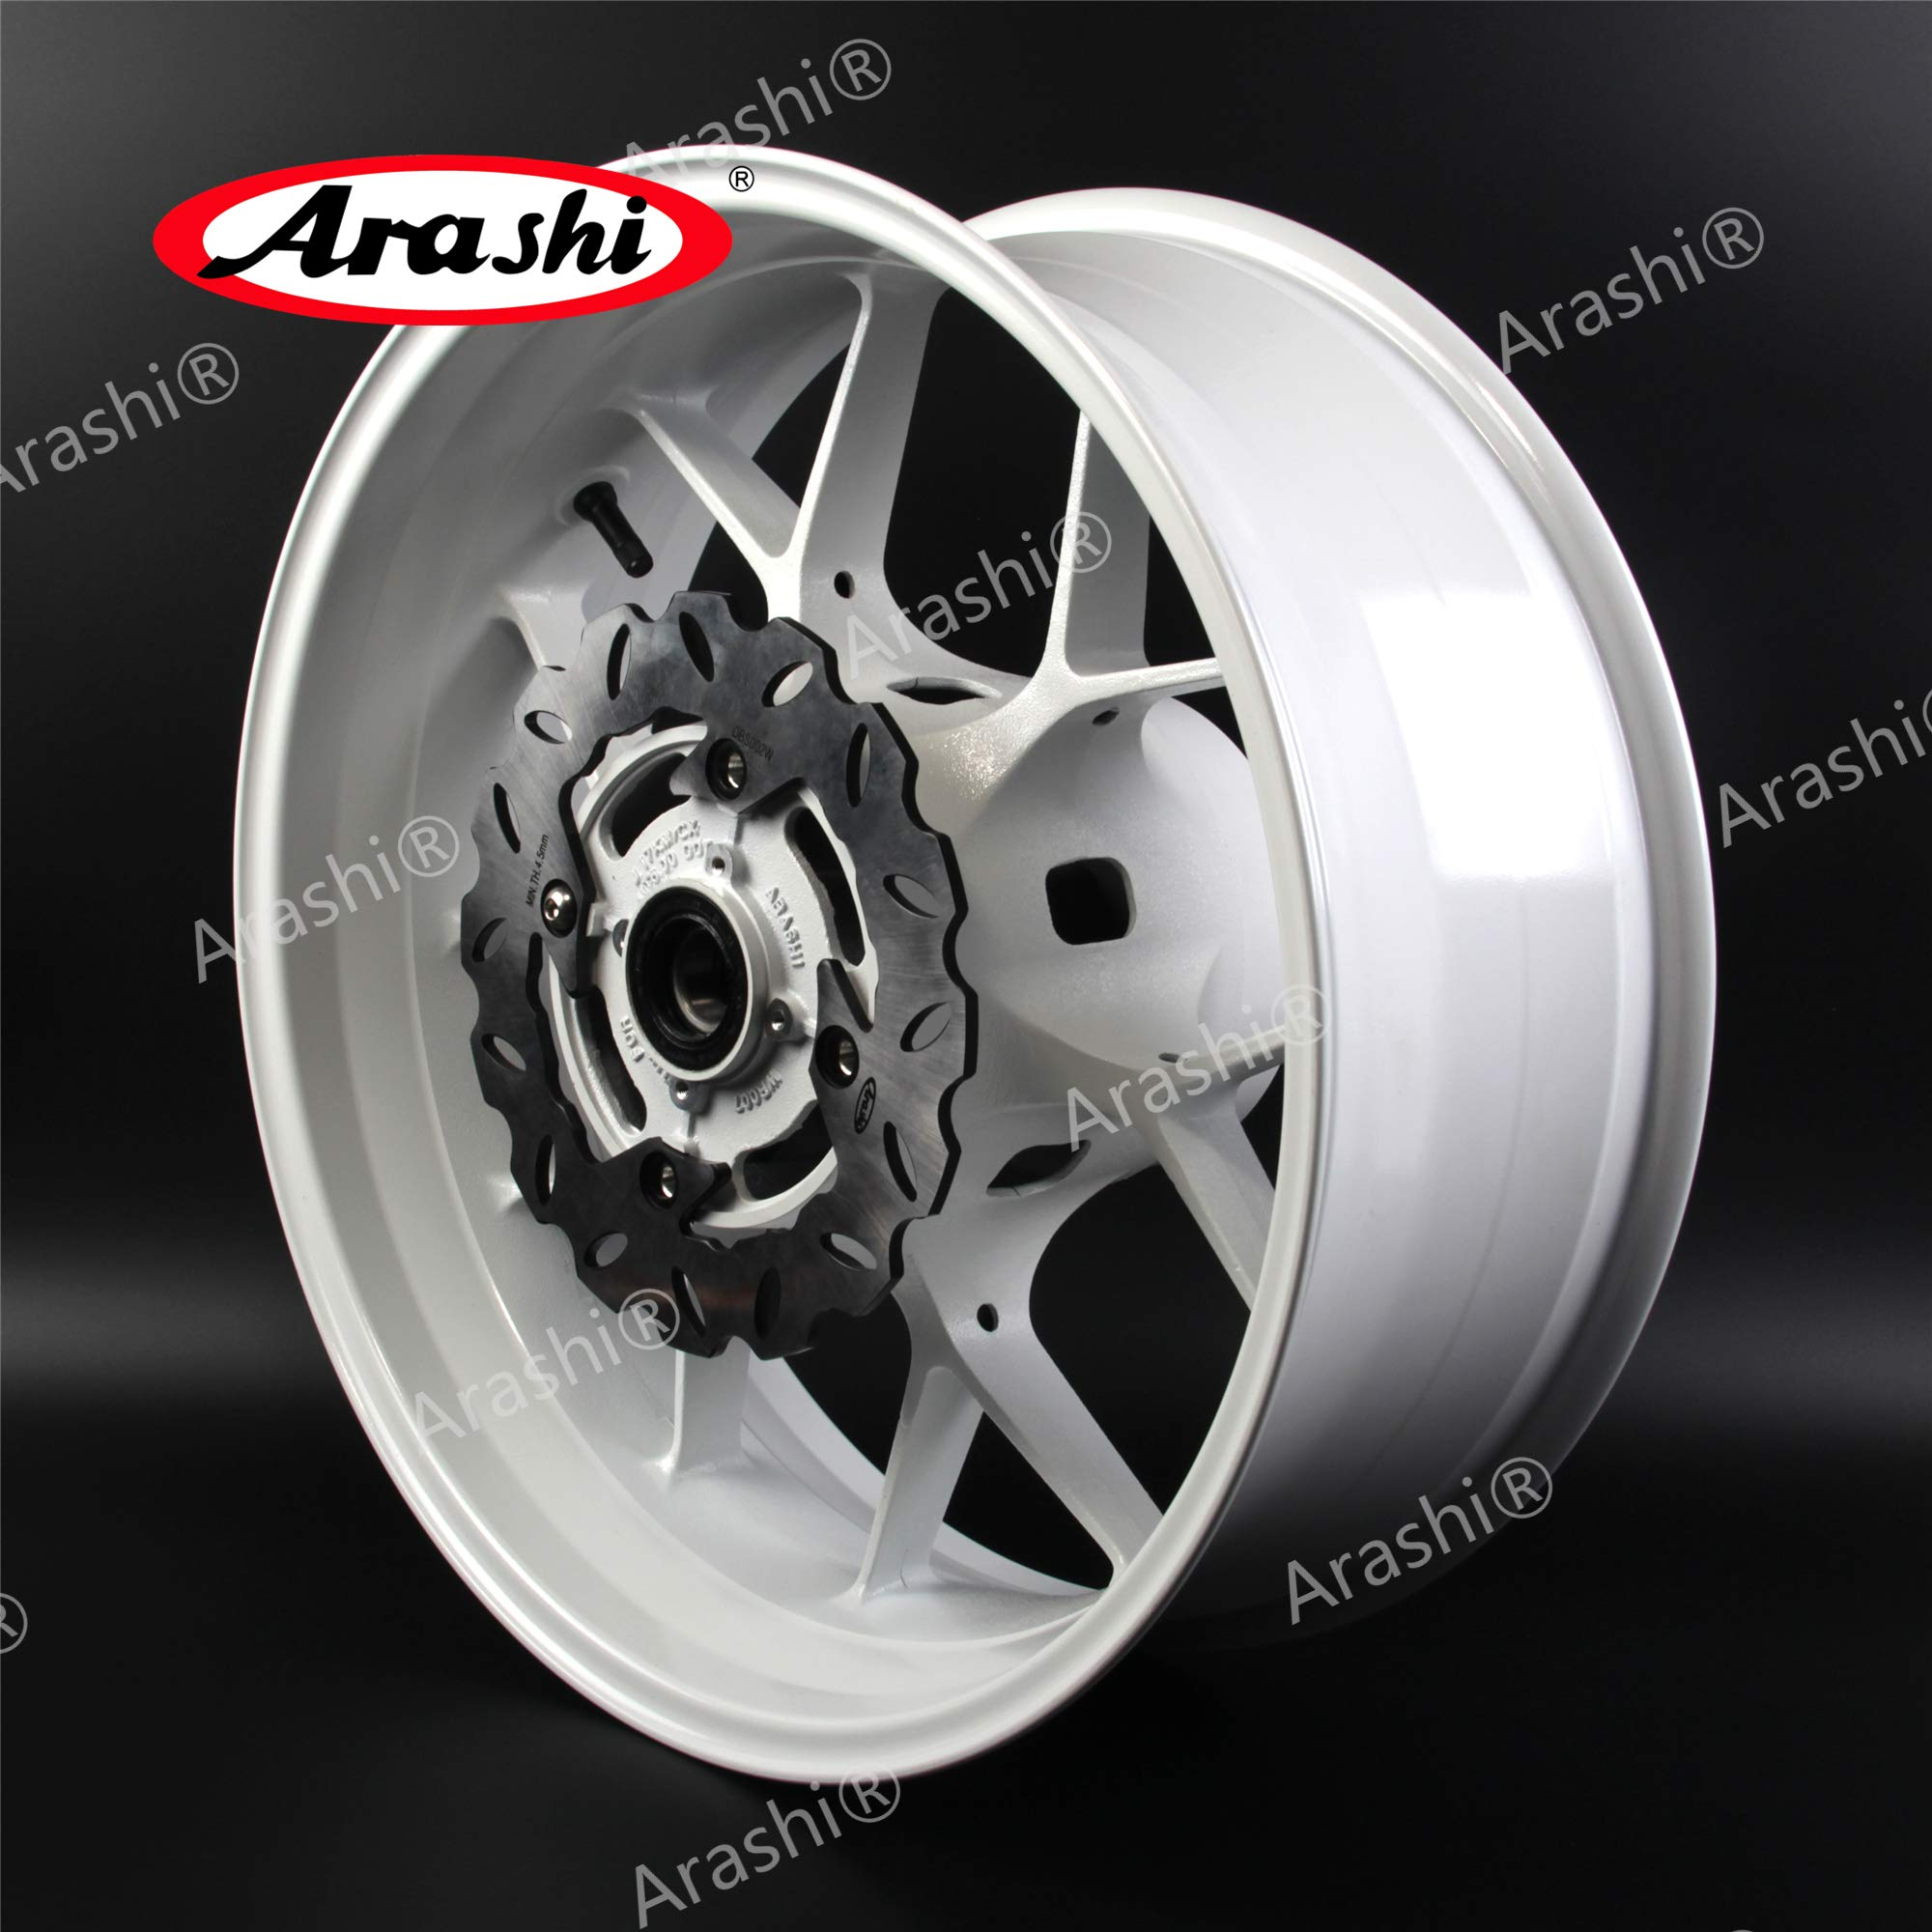 Arashi Rear Wheel Rim and Brake Rotor Disc Disk for HONDA CBR600RR 2007-2017 Motorcycle Accessories CBR 600 RR CBR600 600RR 600CC White 2008 2009 2010 2011 2012 2013 2014 2015 2016